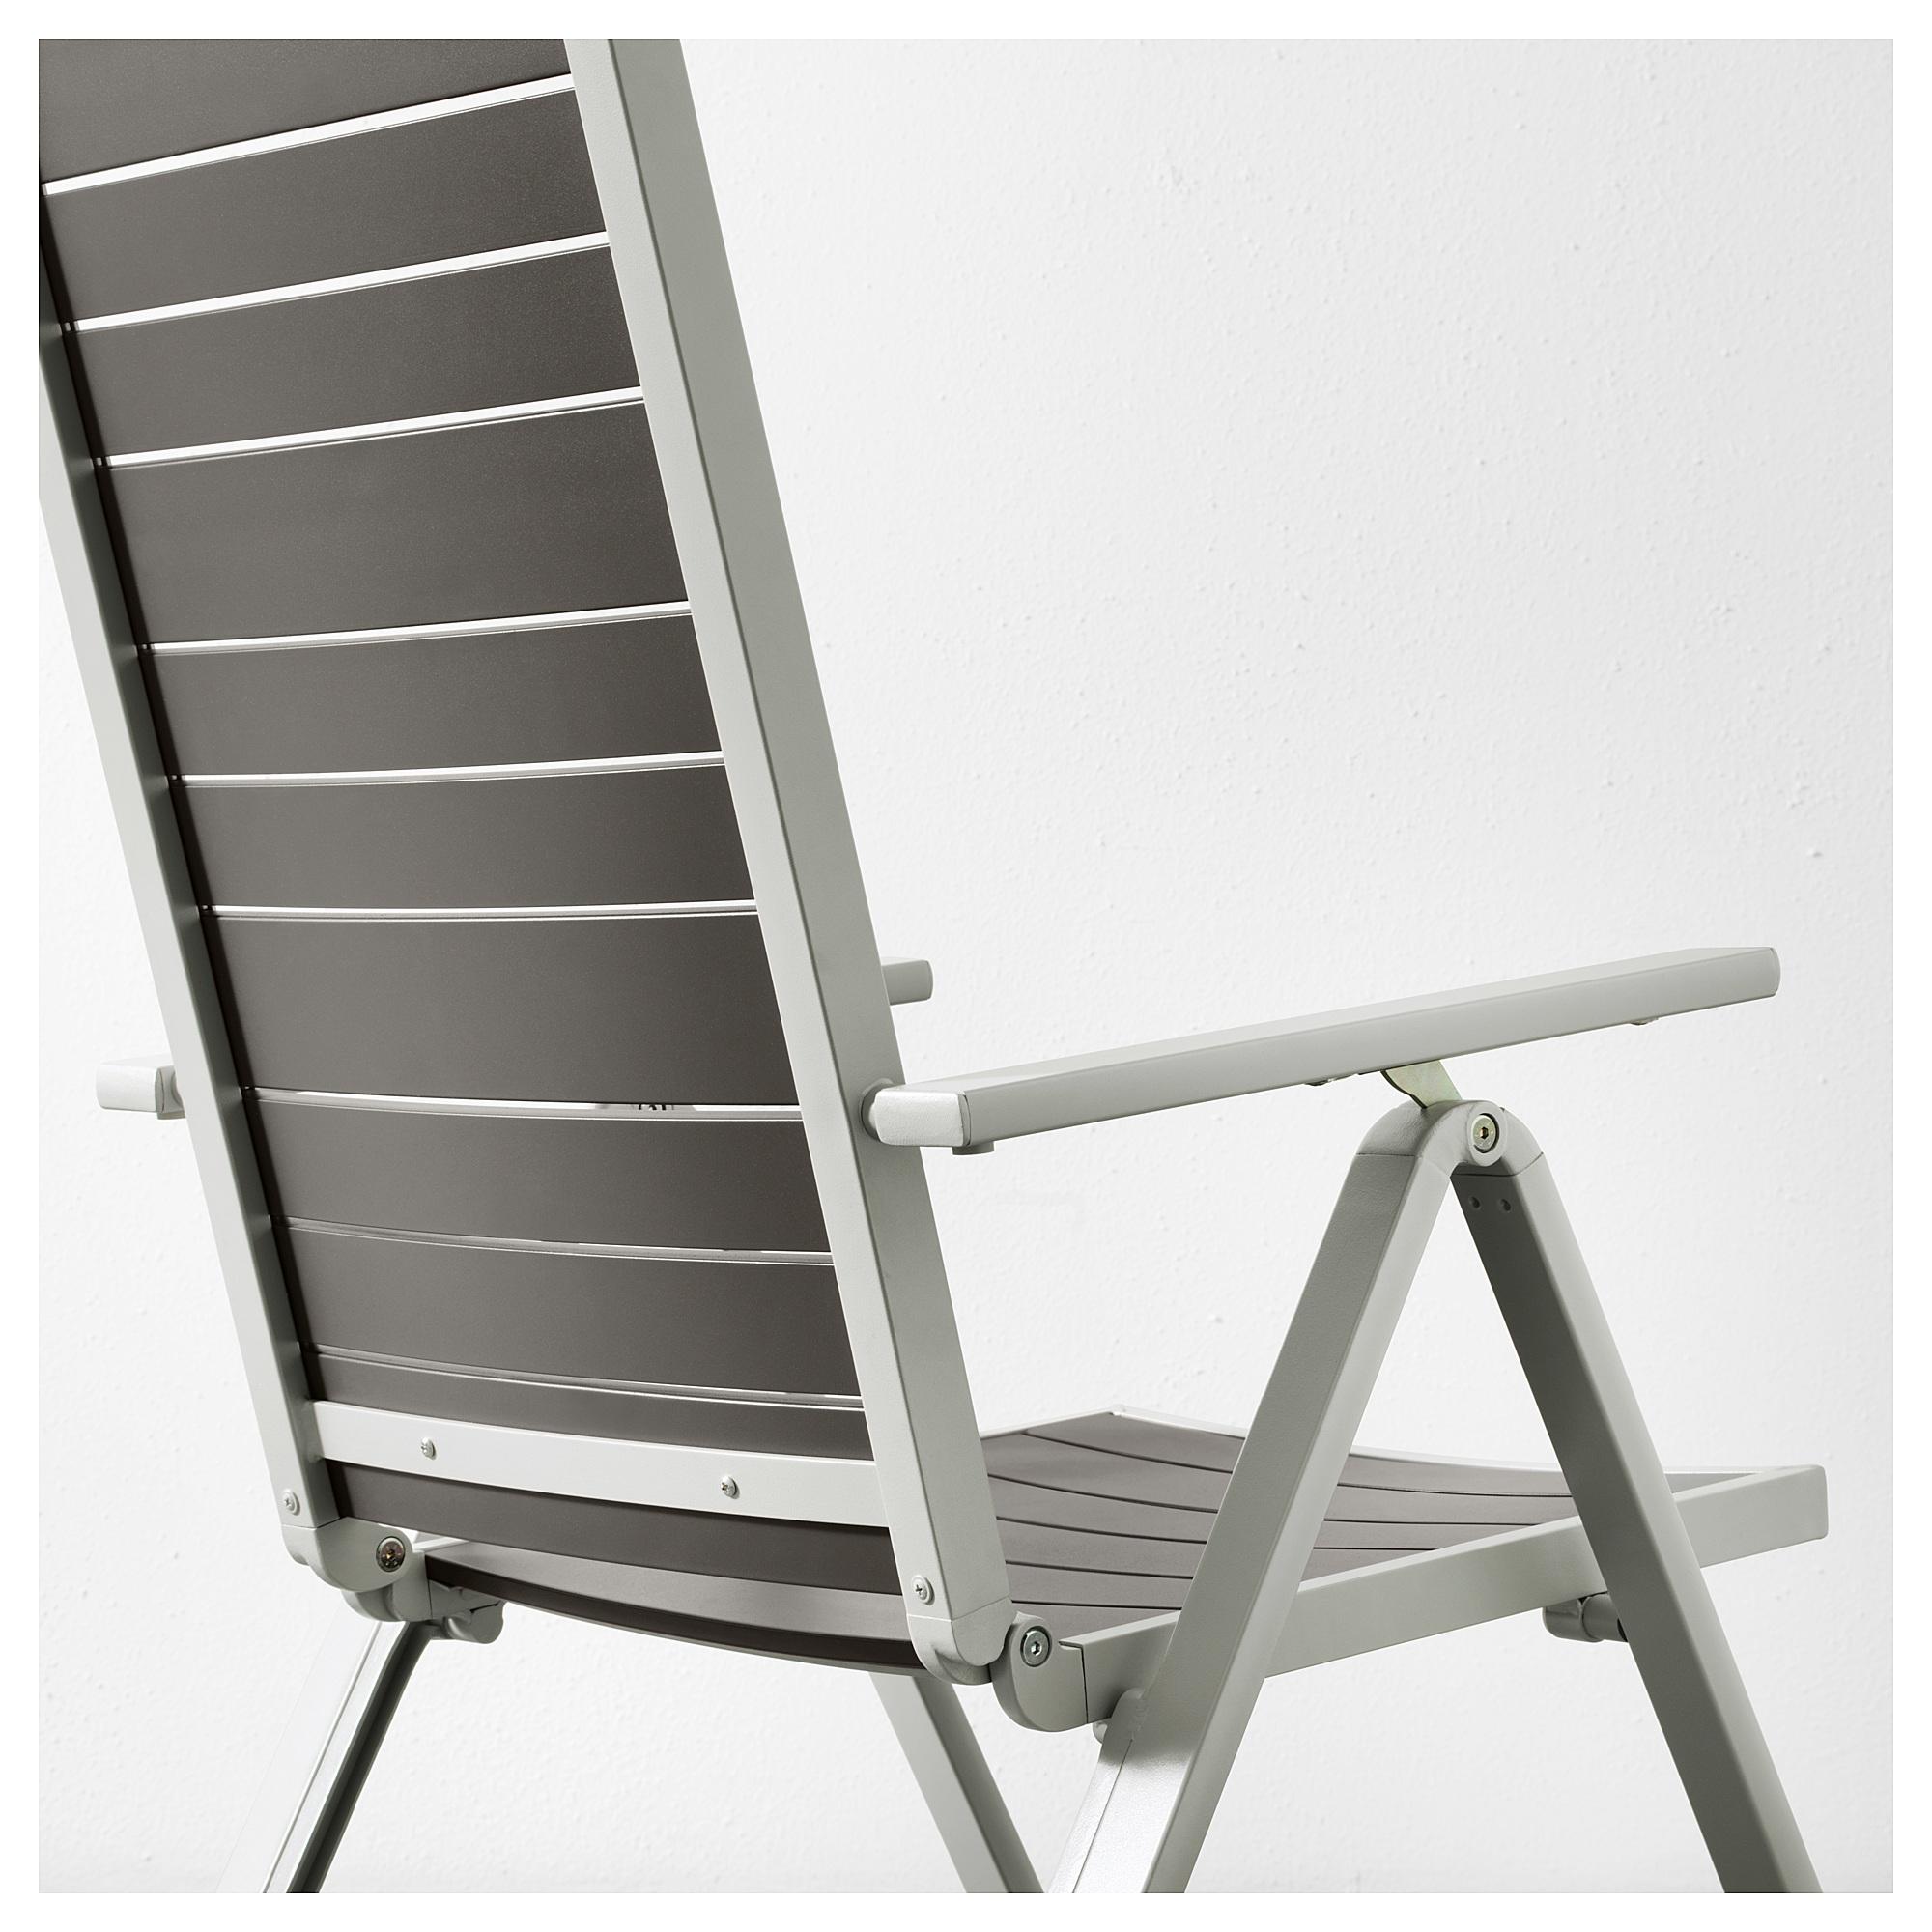 Sj 196 Lland Table 6 Reclining Chairs Outdoor Dark Grey